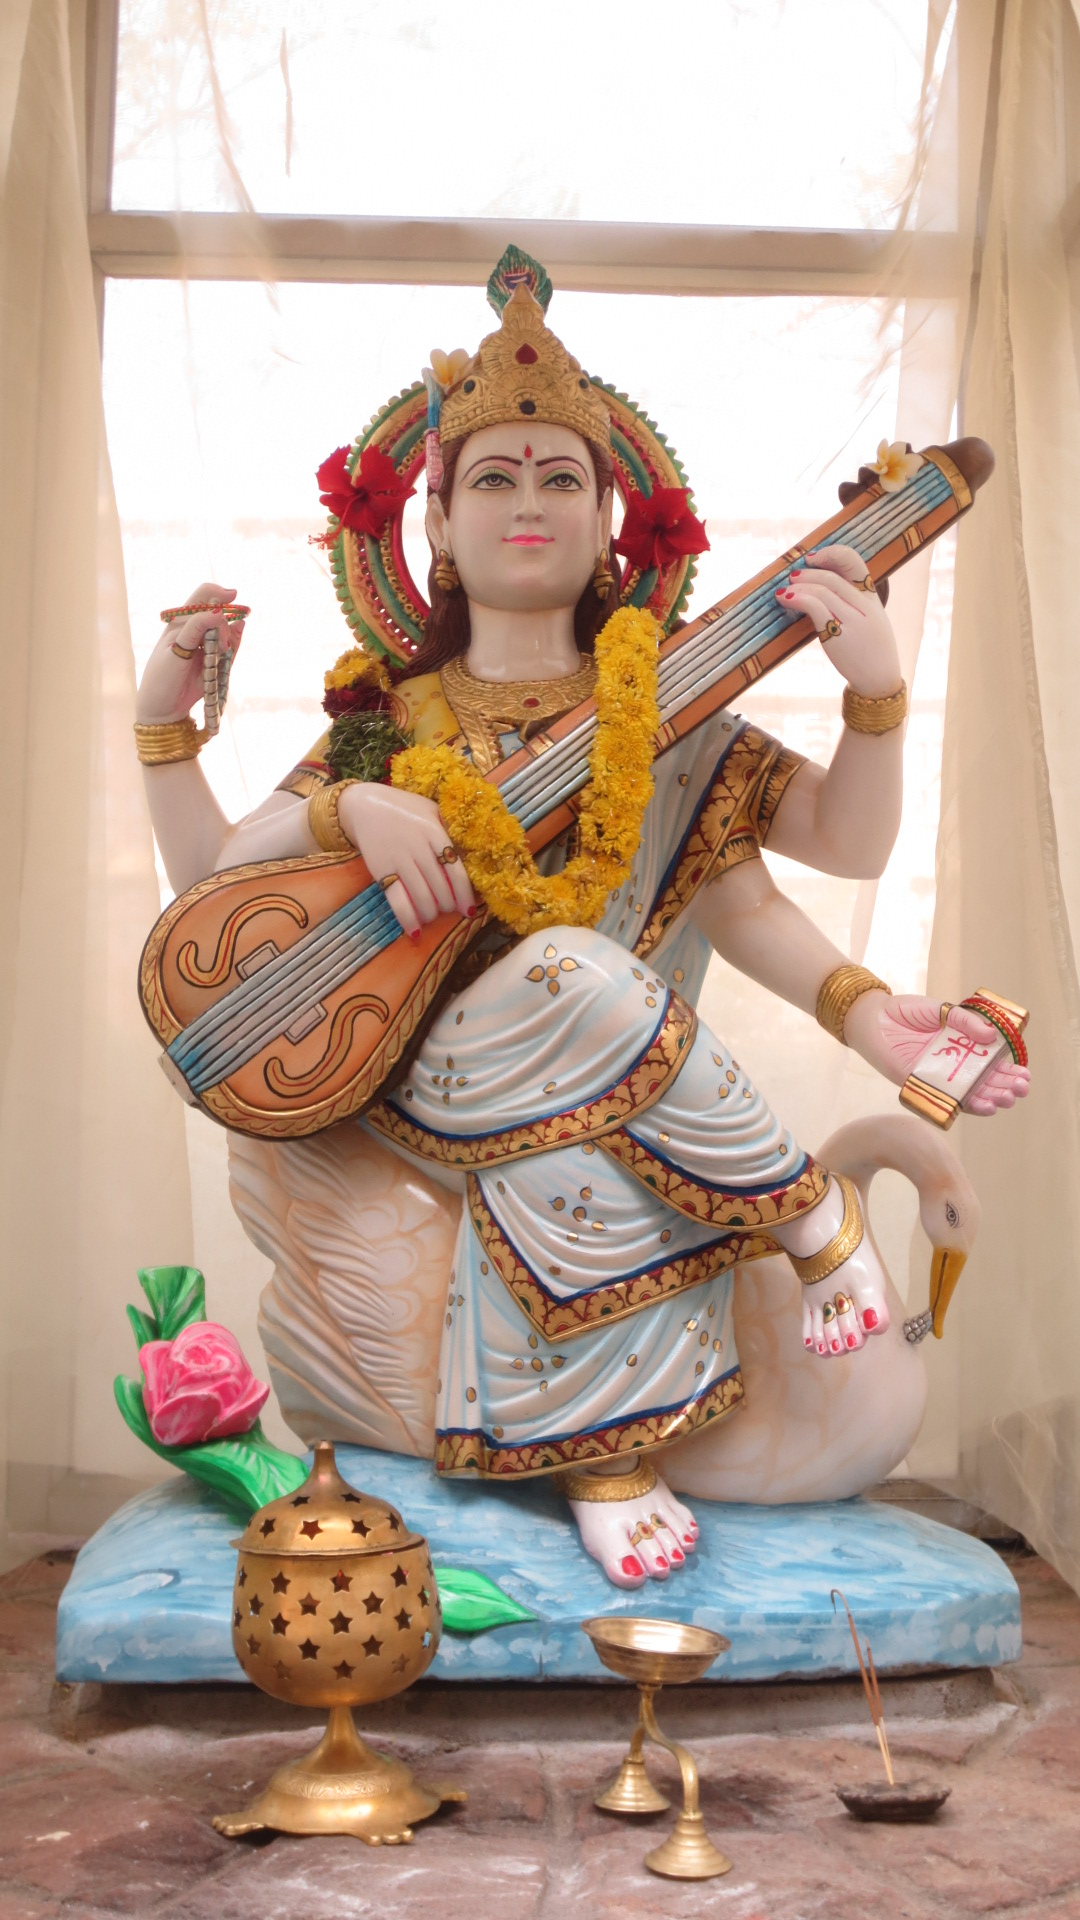 Tiefe Einblicke in die Bhagawad-Gita